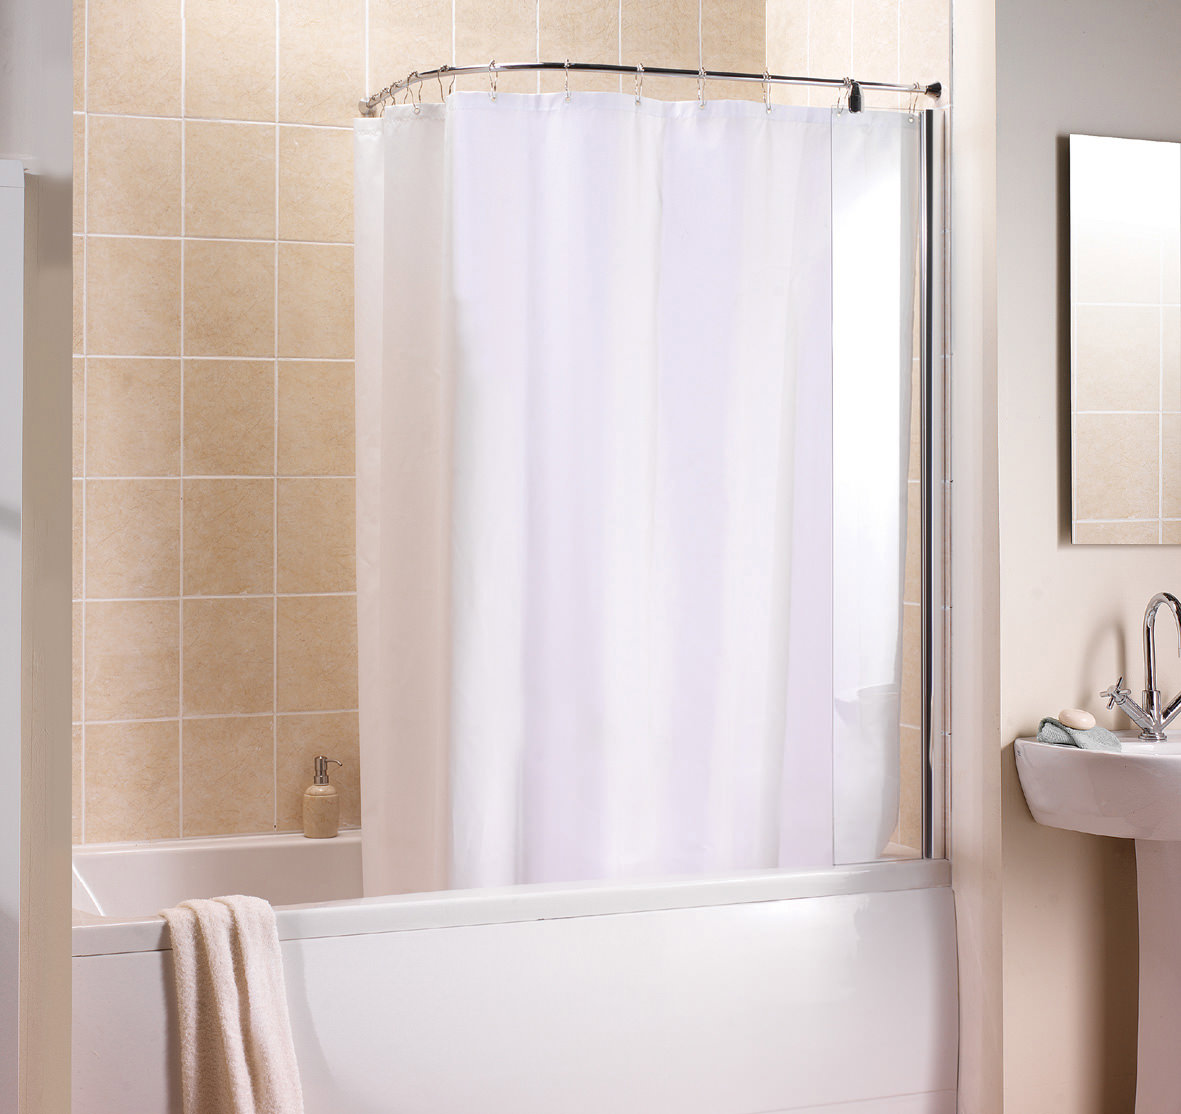 Curved Shower Curtain Rail Over Bath Curtain Menzilperde Net